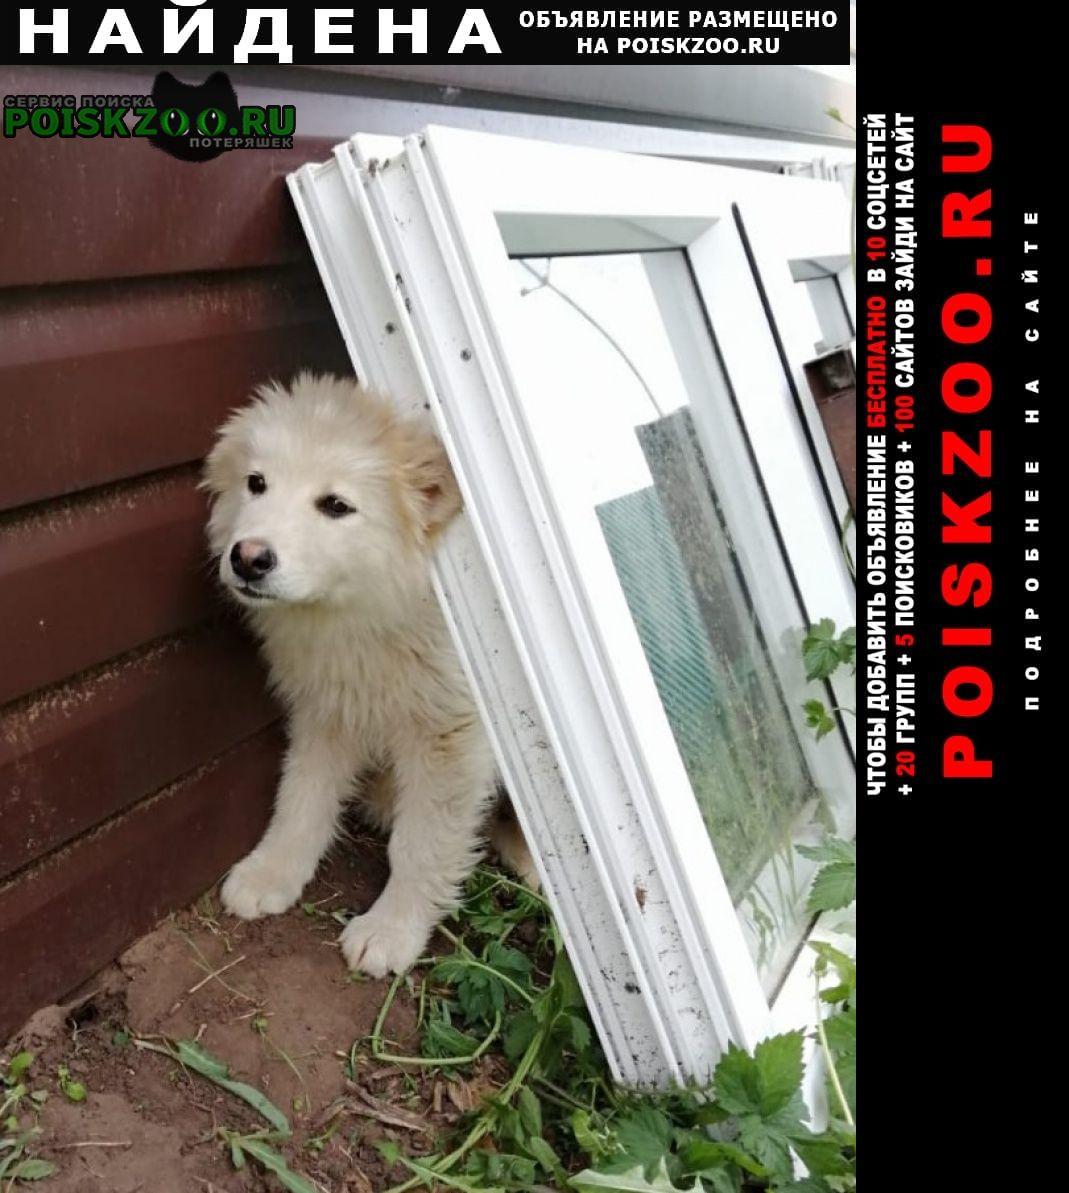 Найдена собака в п. жуково Уфа